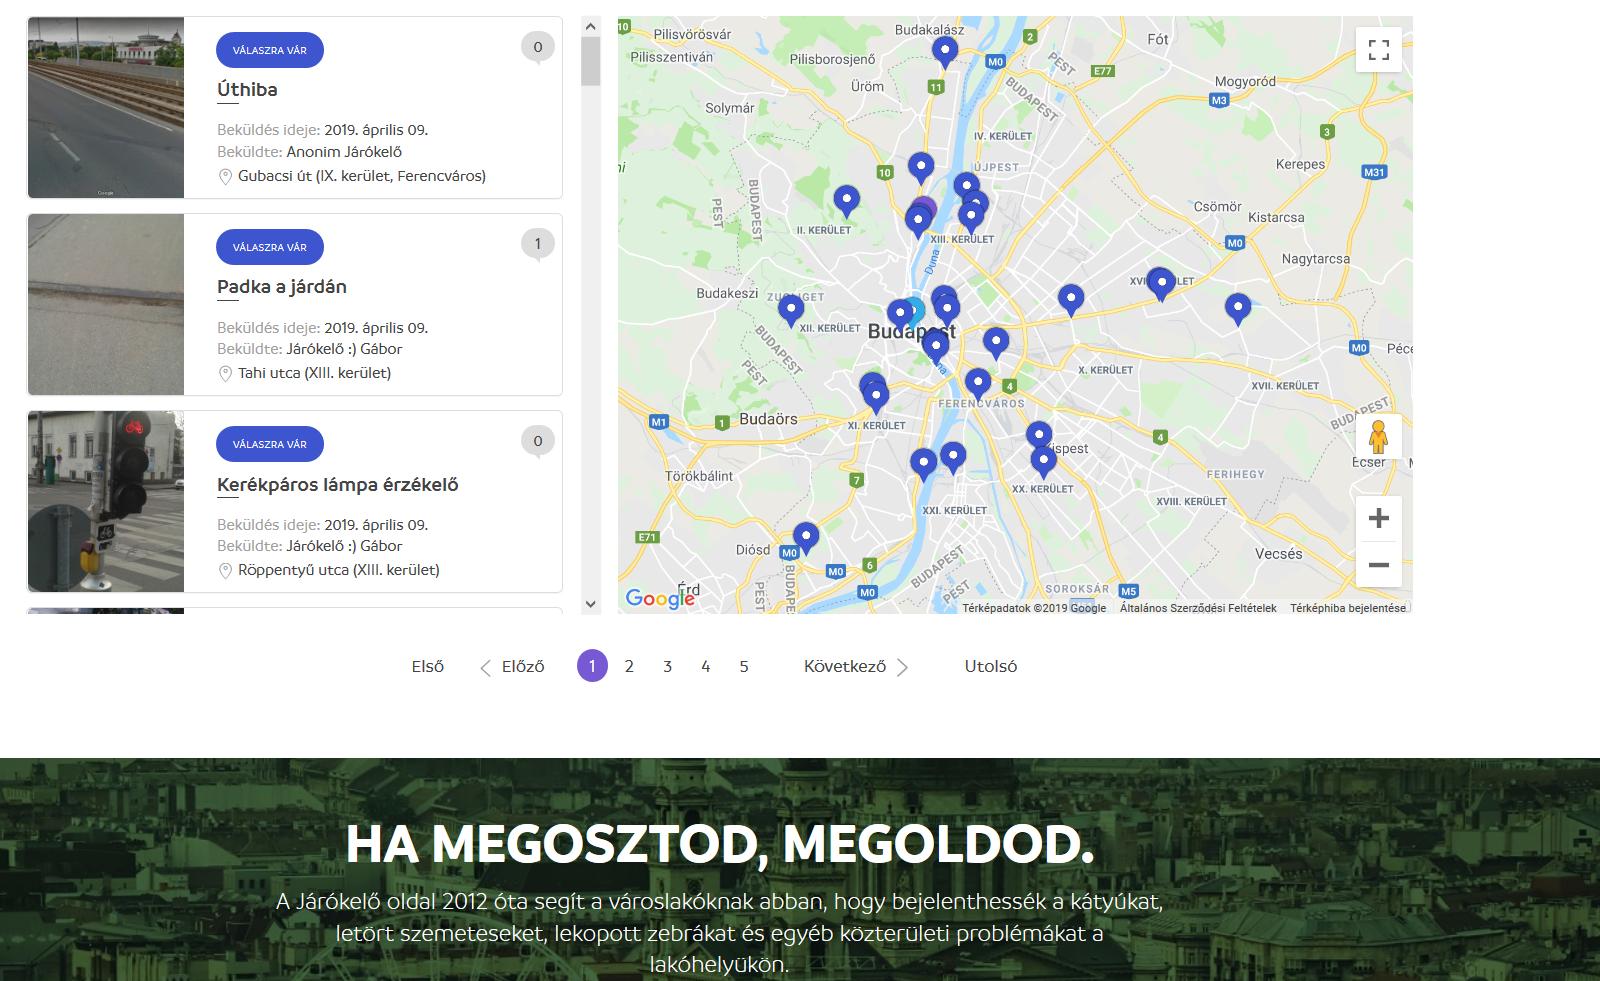 screenshot_2019-04-10_jarokelo_hu_ha_megosztod_megoldod.png